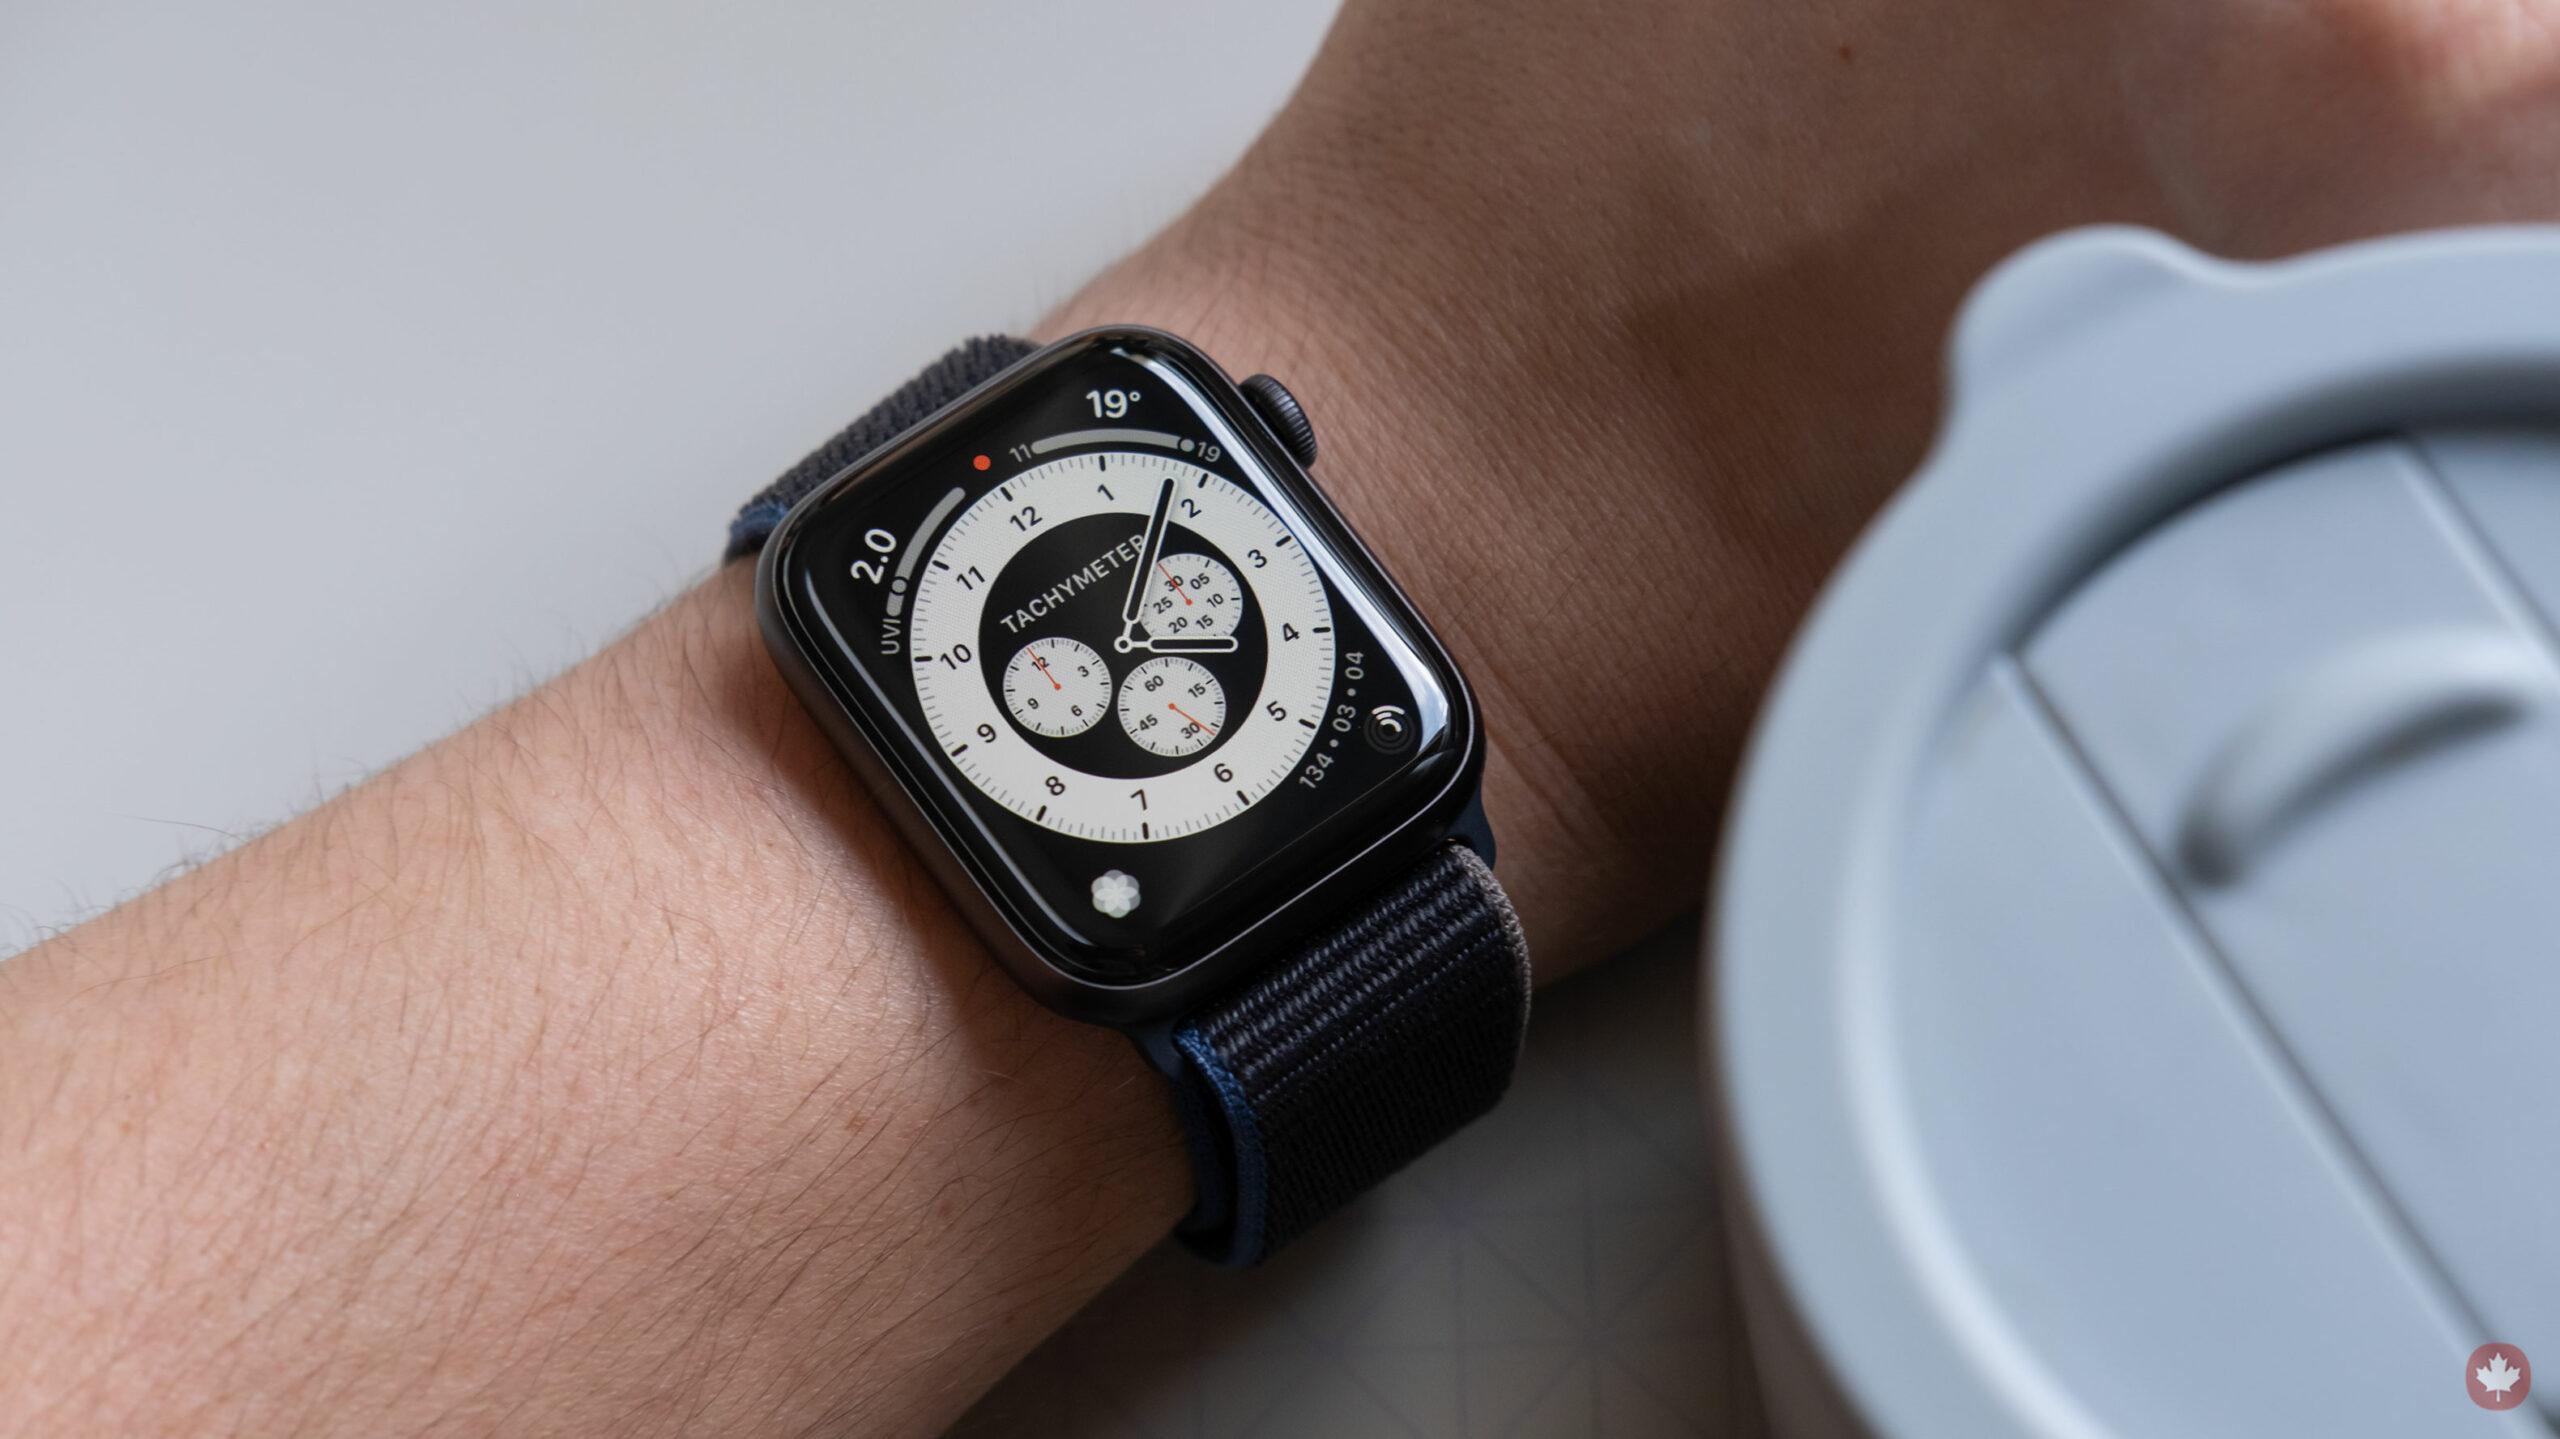 Apple Watch SE Review: Great starter smartwatch